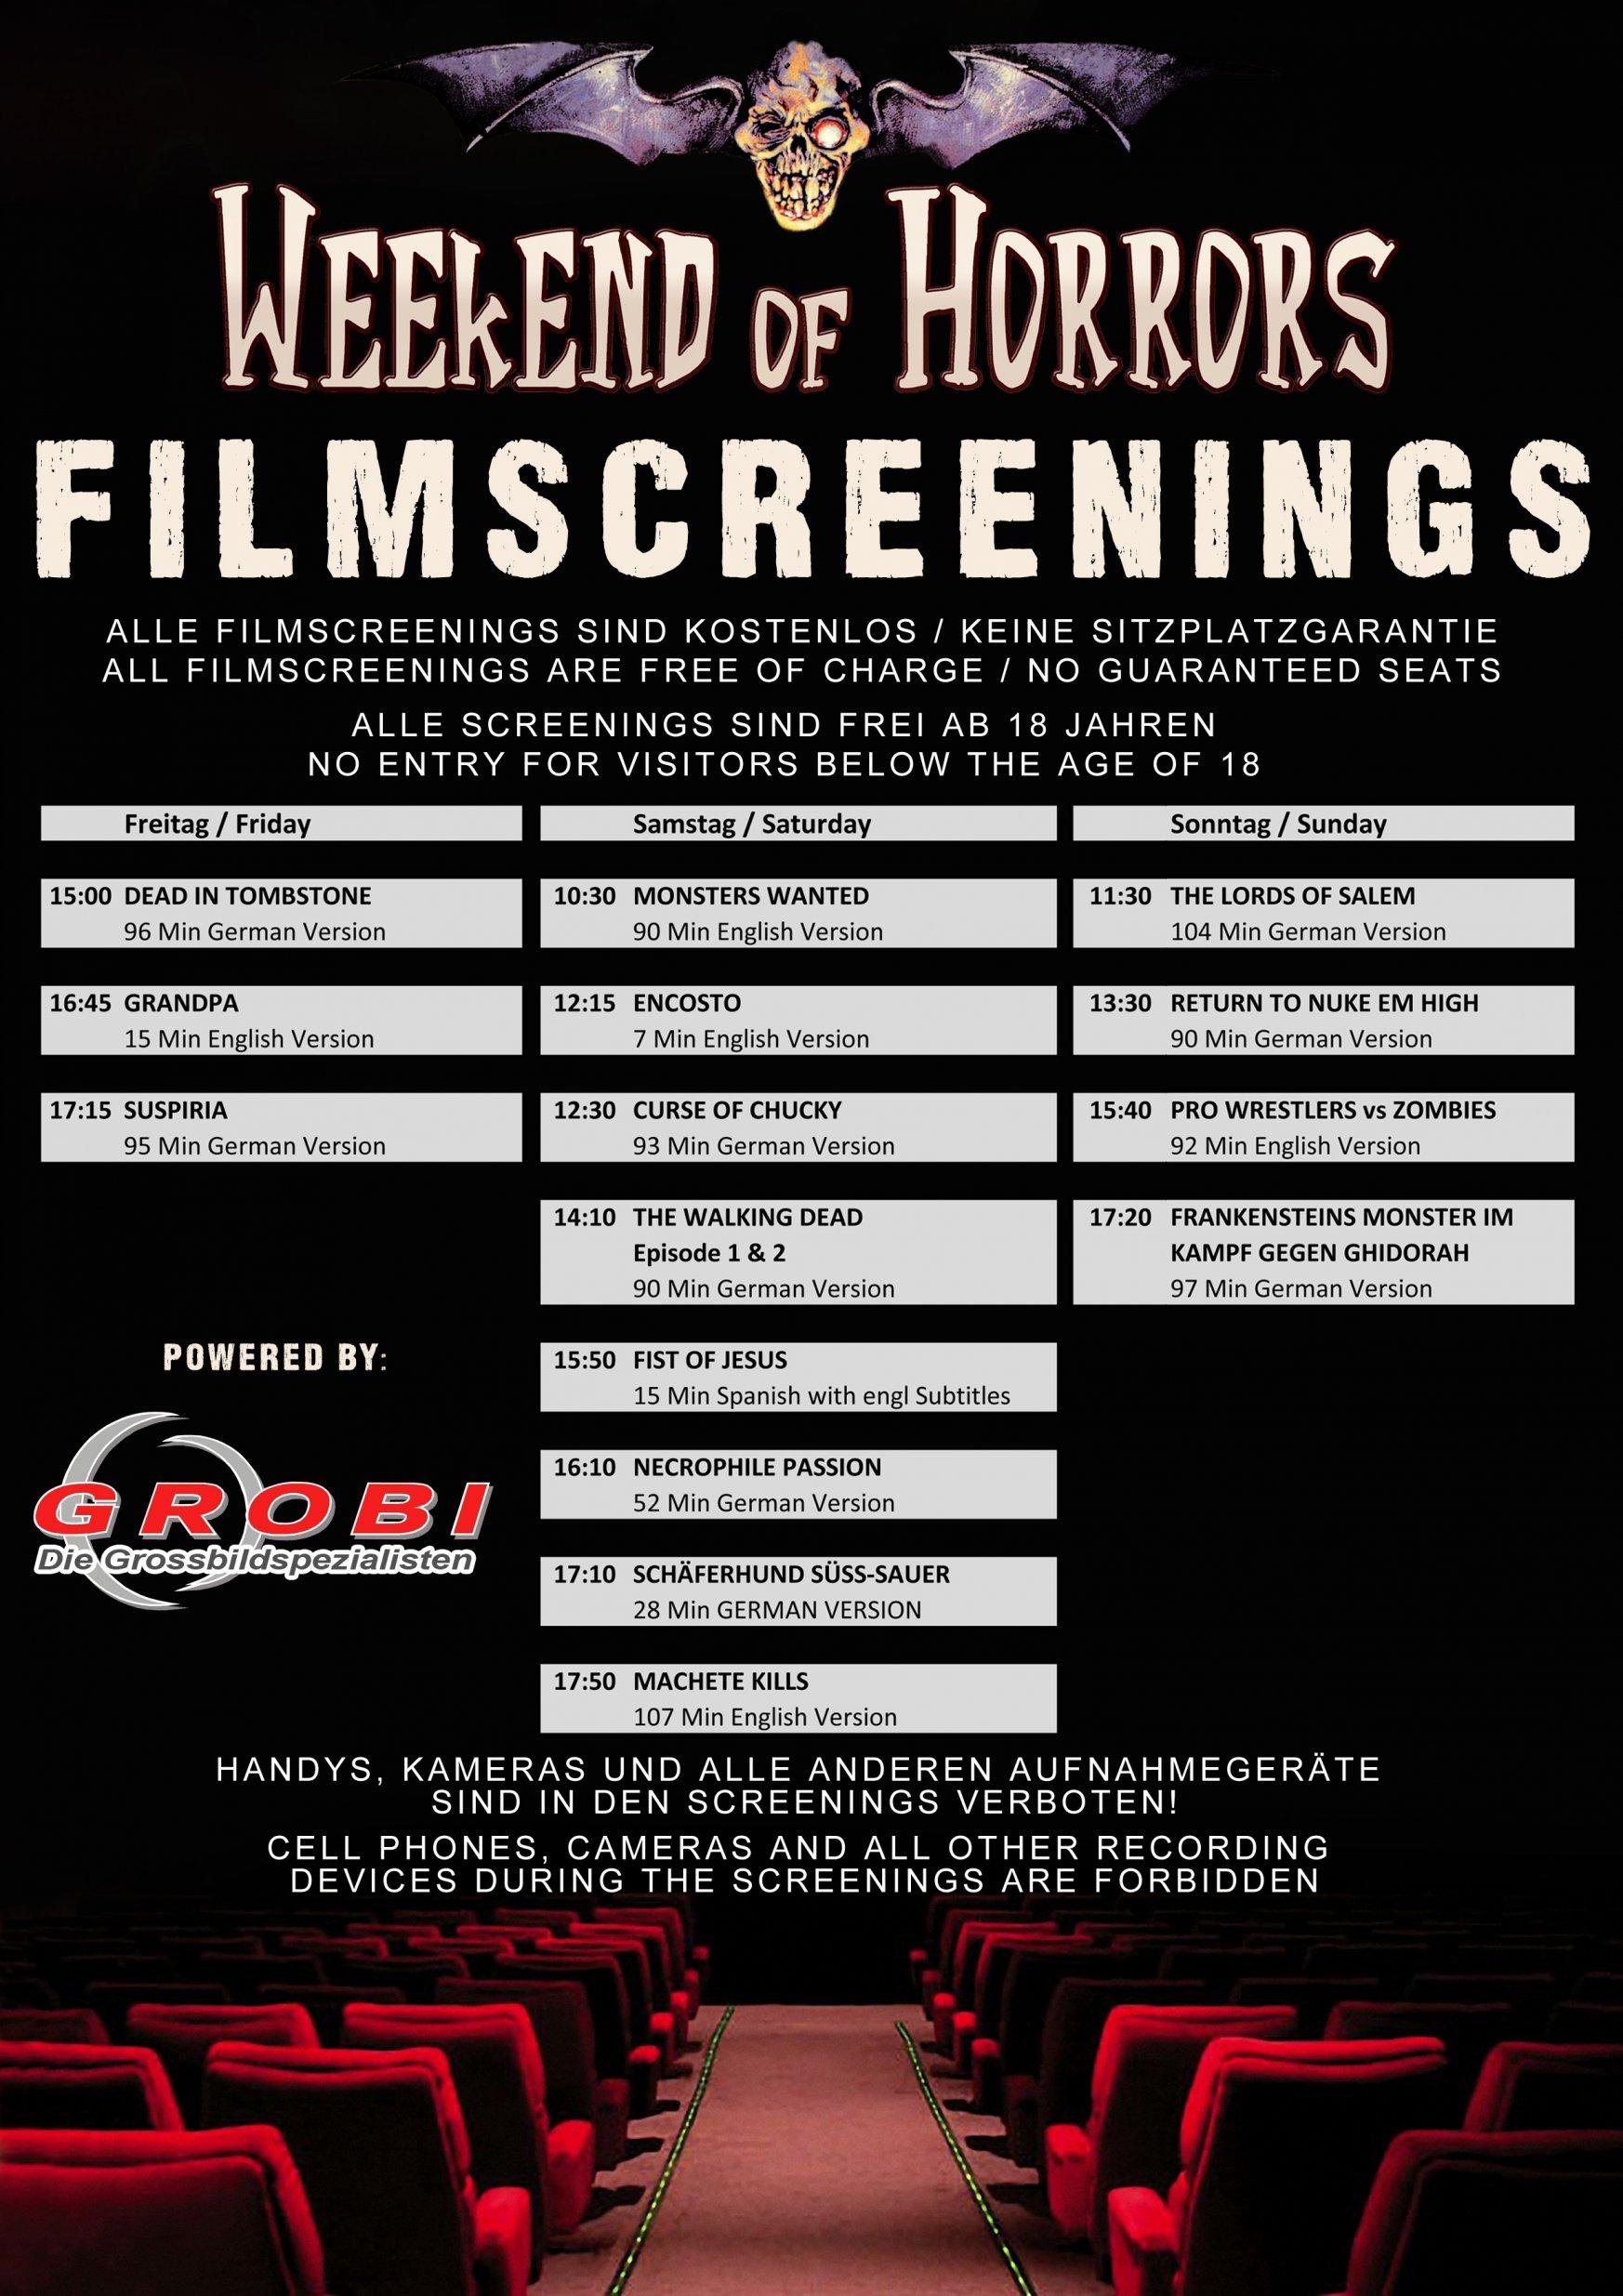 Filmscreenings